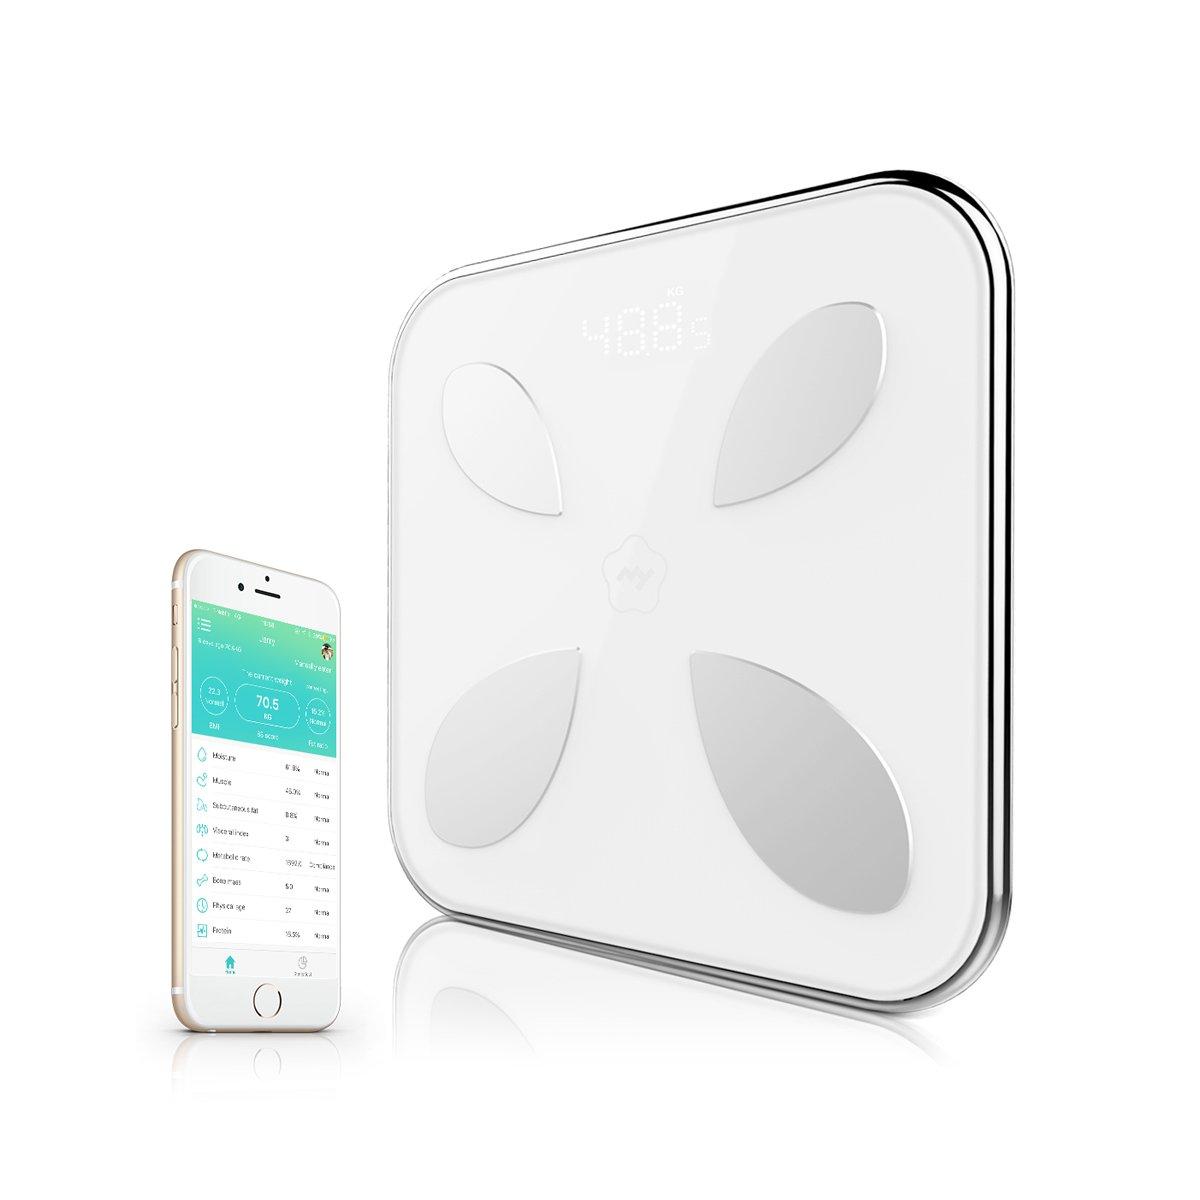 Adesugata Bluetooth Smart grasa corporal escala con App para IOS Android dispositivos, Digital analizador de grasa corporal báscula de baño peso datos ...